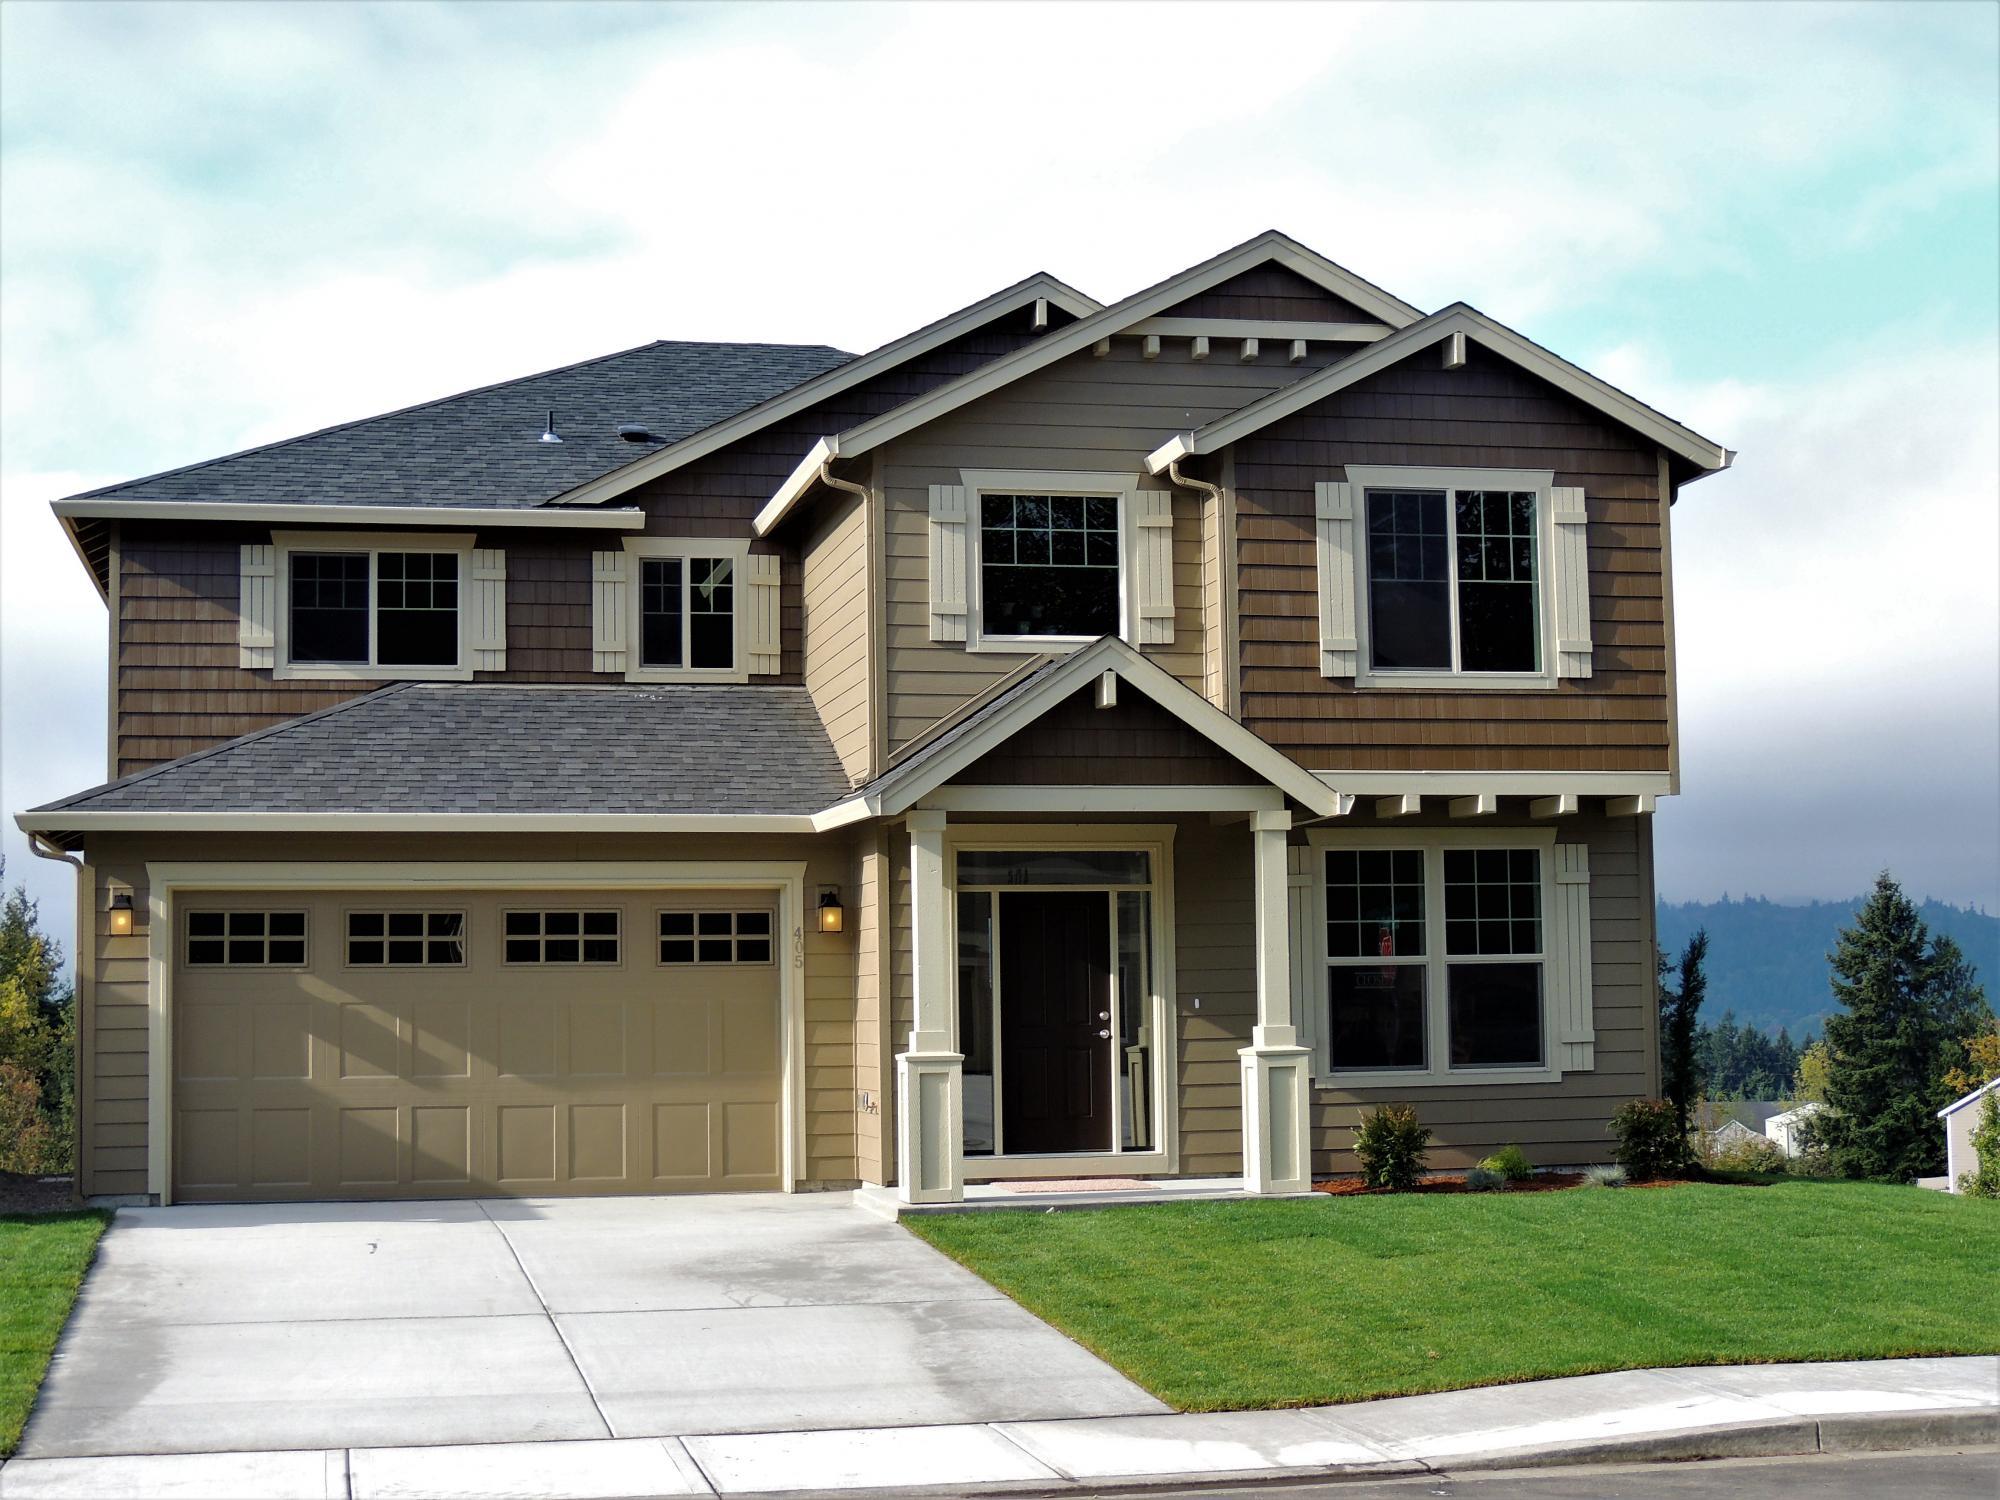 Stoneridge homes vancouver wa avie home for Stoneridge builders